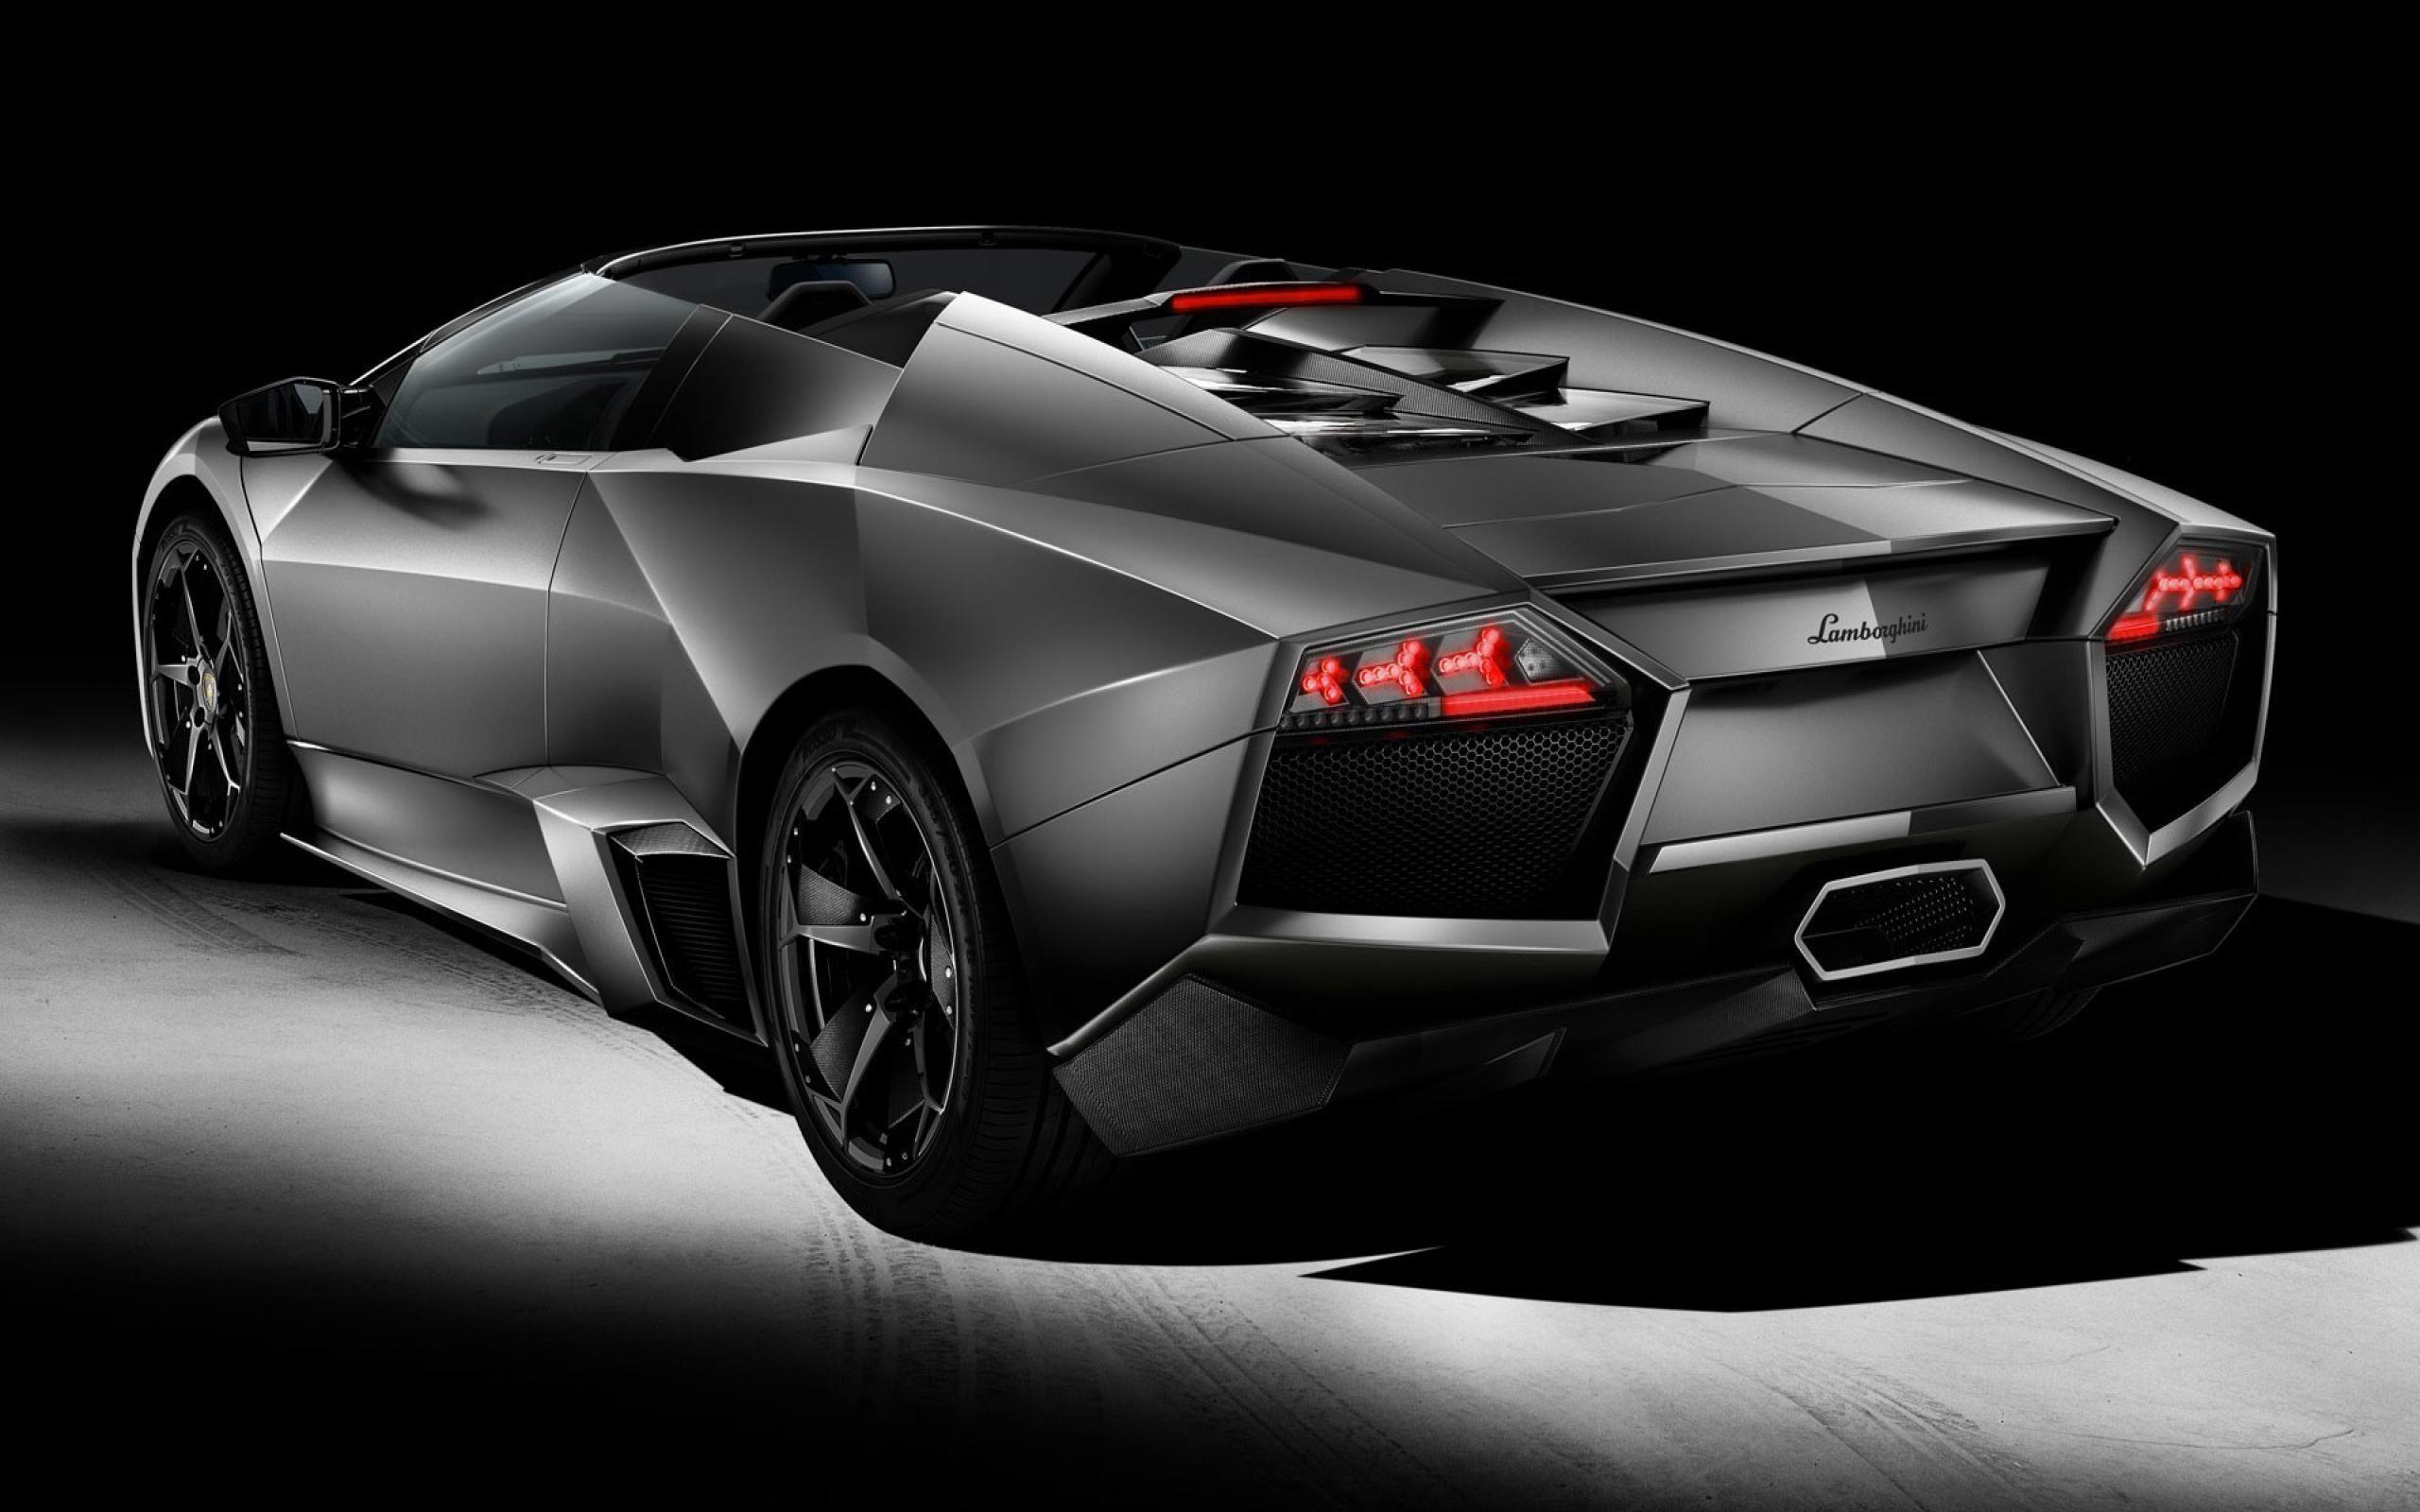 Lamborghini Reventon Hd Wallpapers Wallpaper Cave